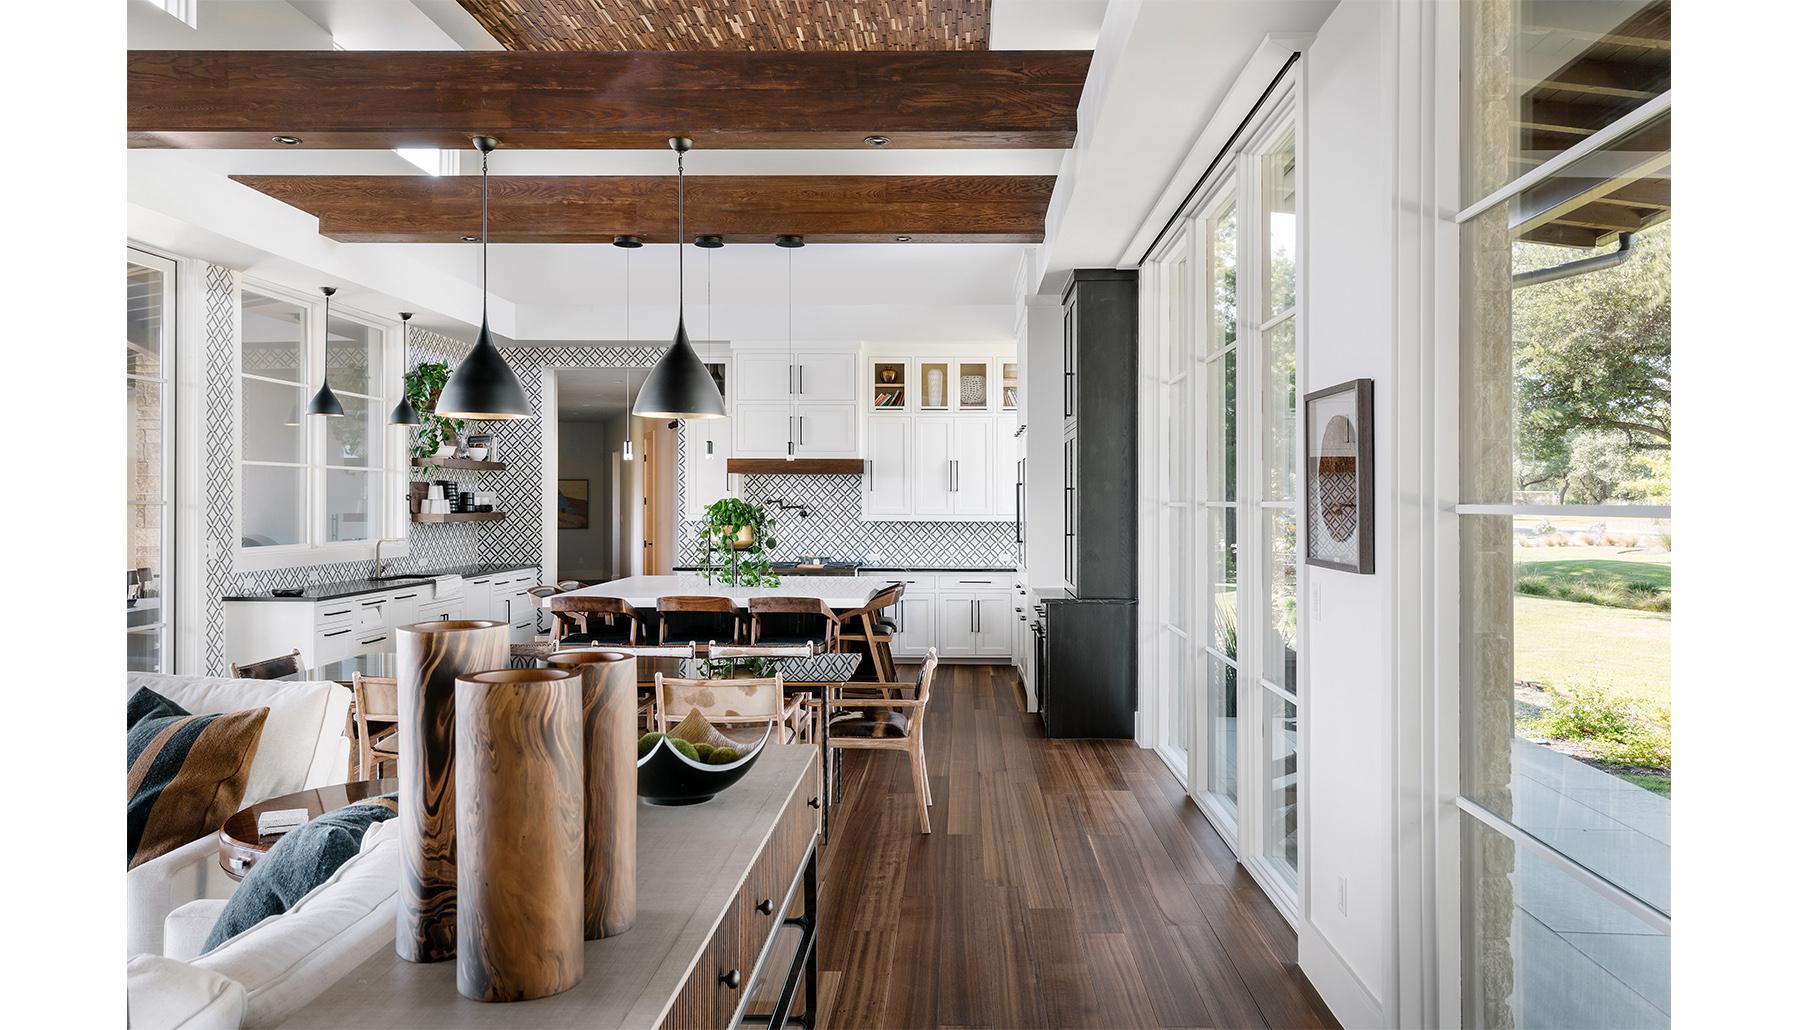 Spicewood Kitchen Overview